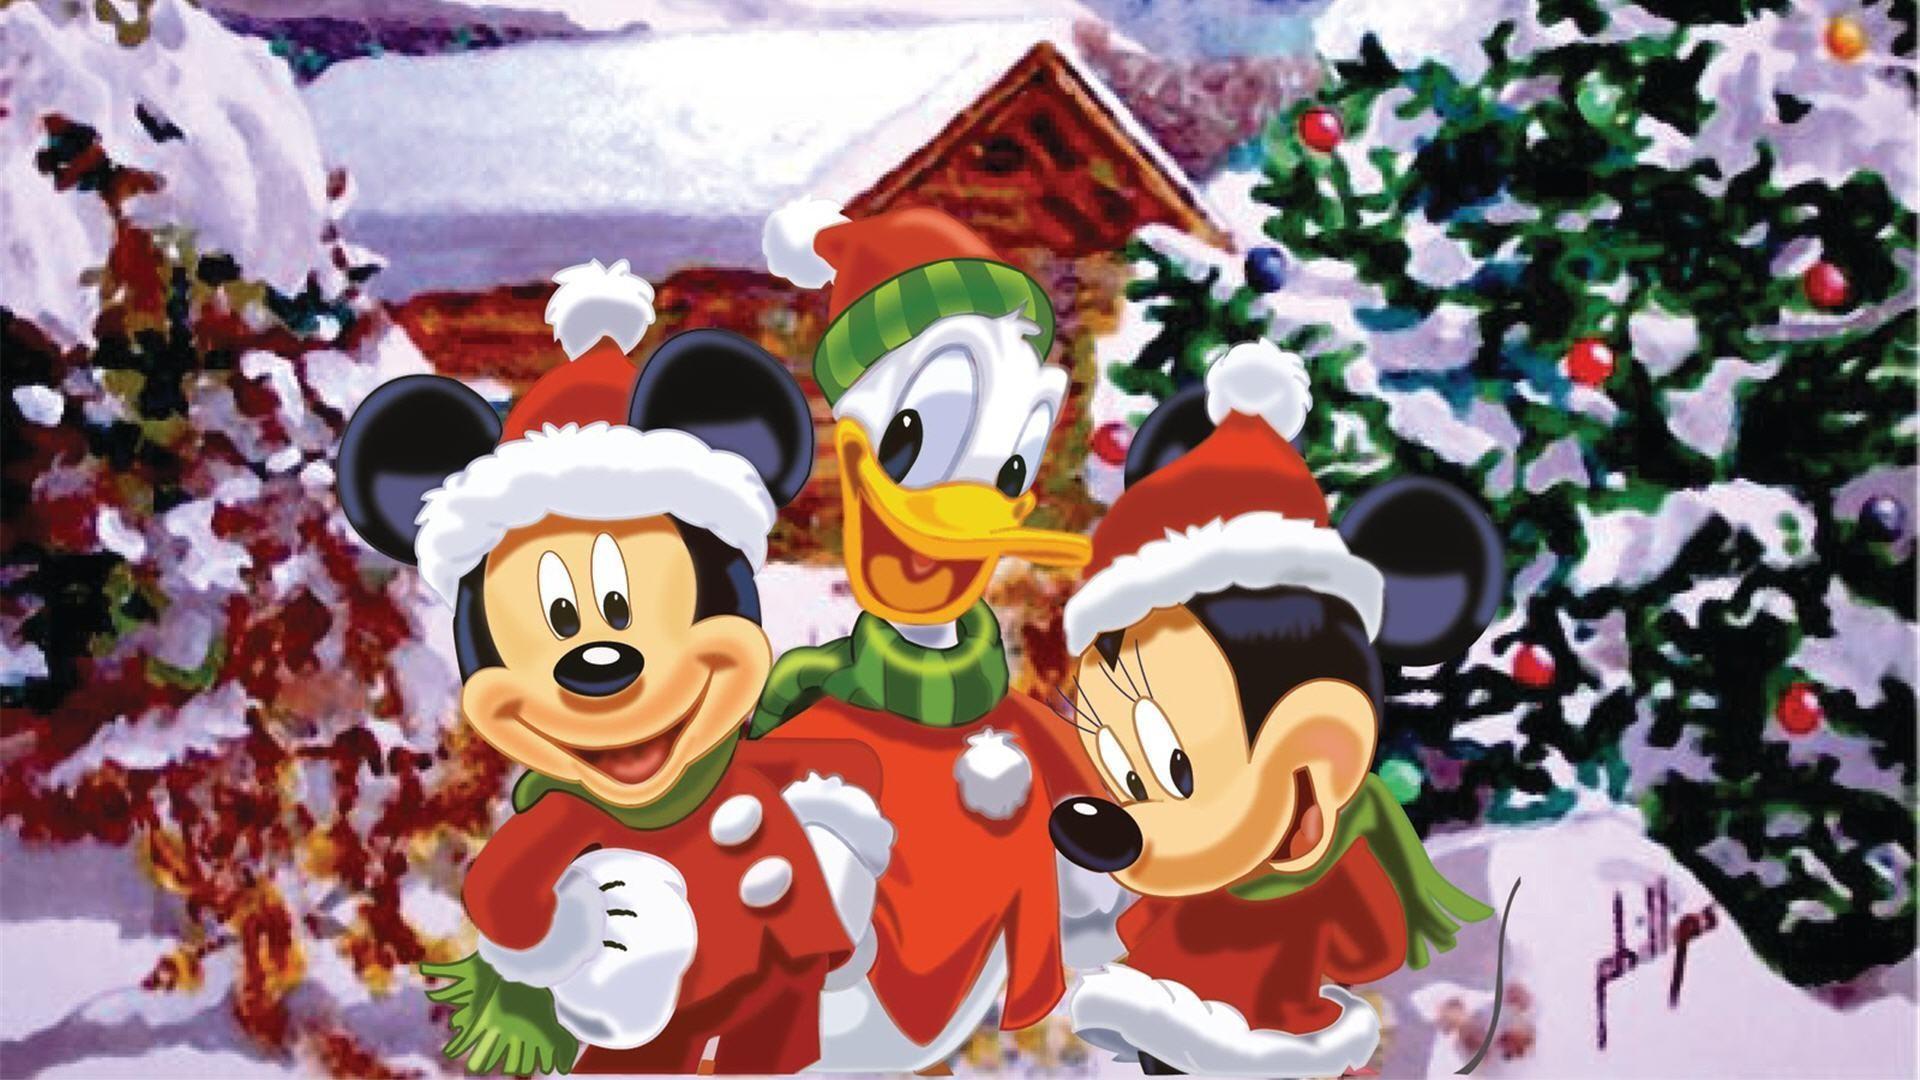 Mickey Mouse Christmas Wallpaper ·①